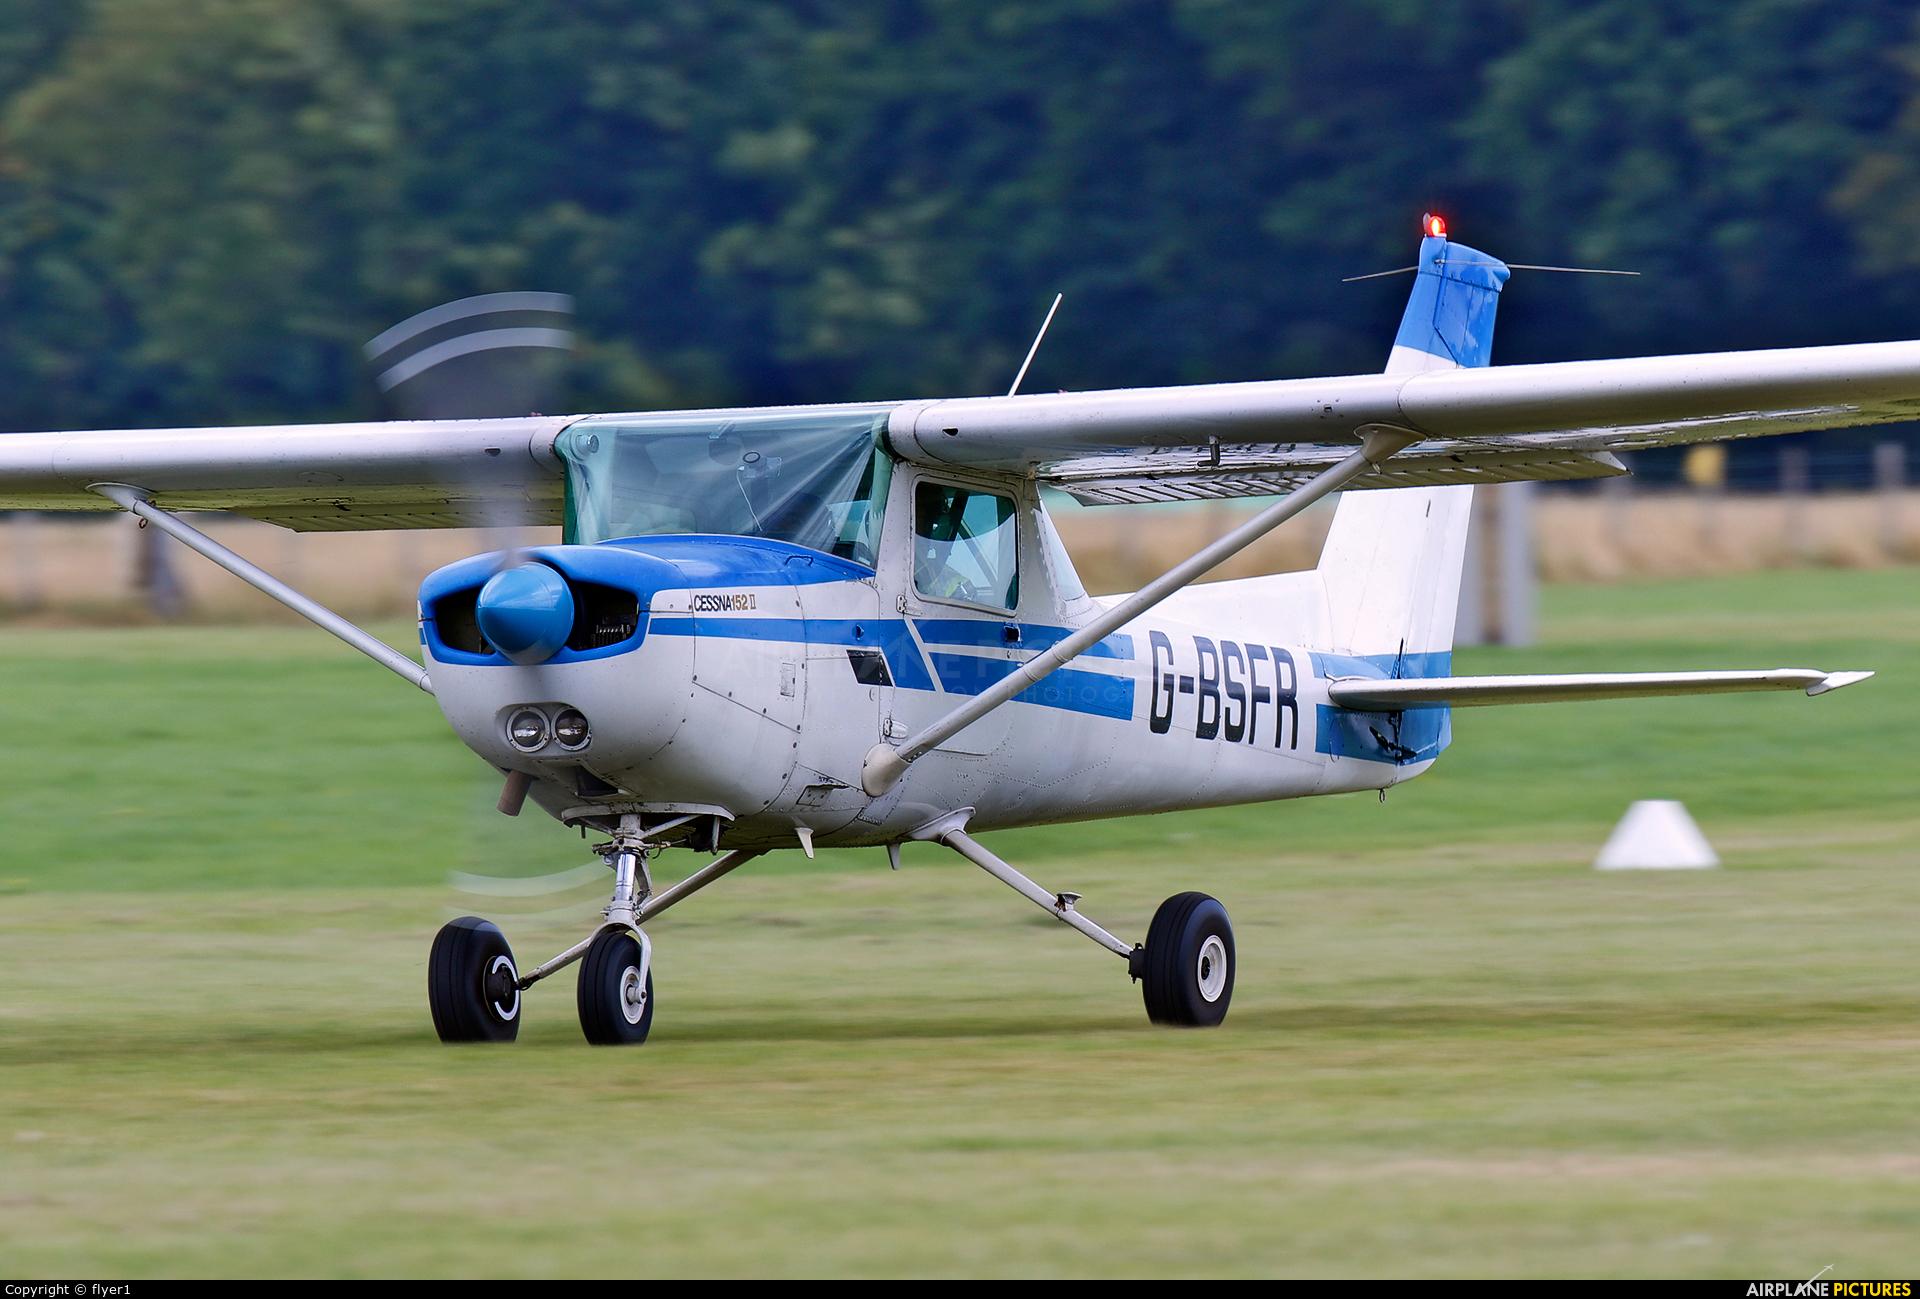 Private G-BSFR aircraft at Lashenden / Headcorn